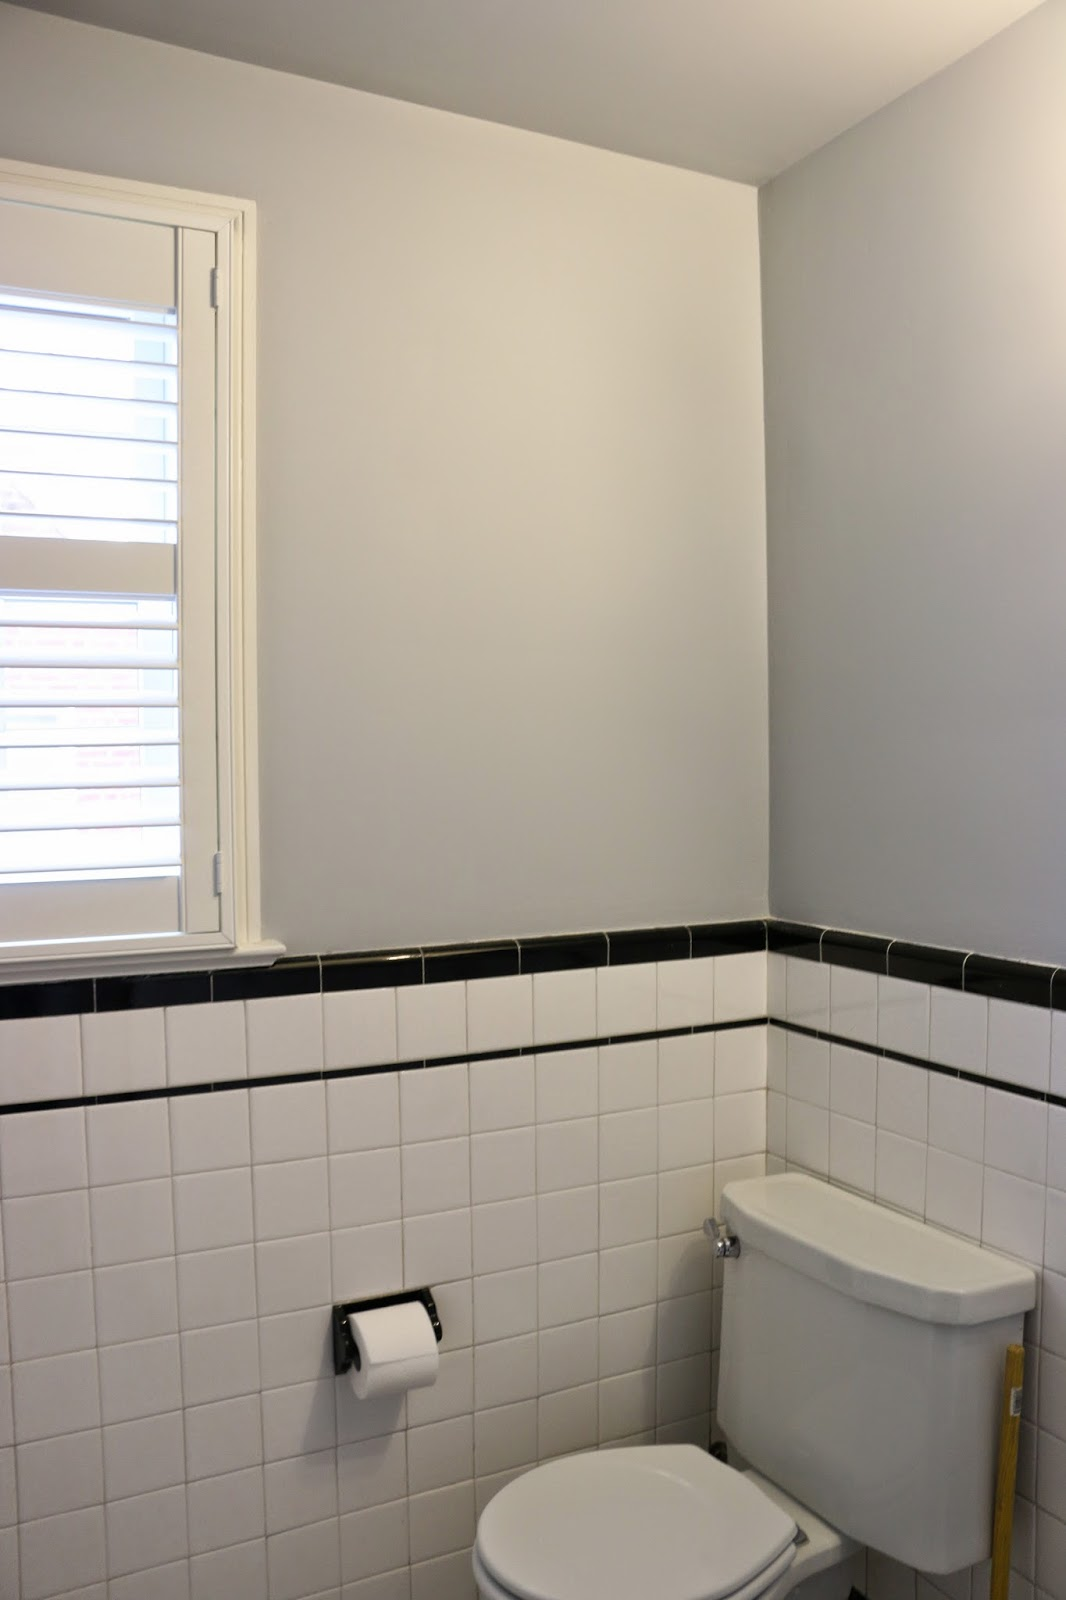 Paint For Bathroom Walls And Ceiling Bathroom Decor